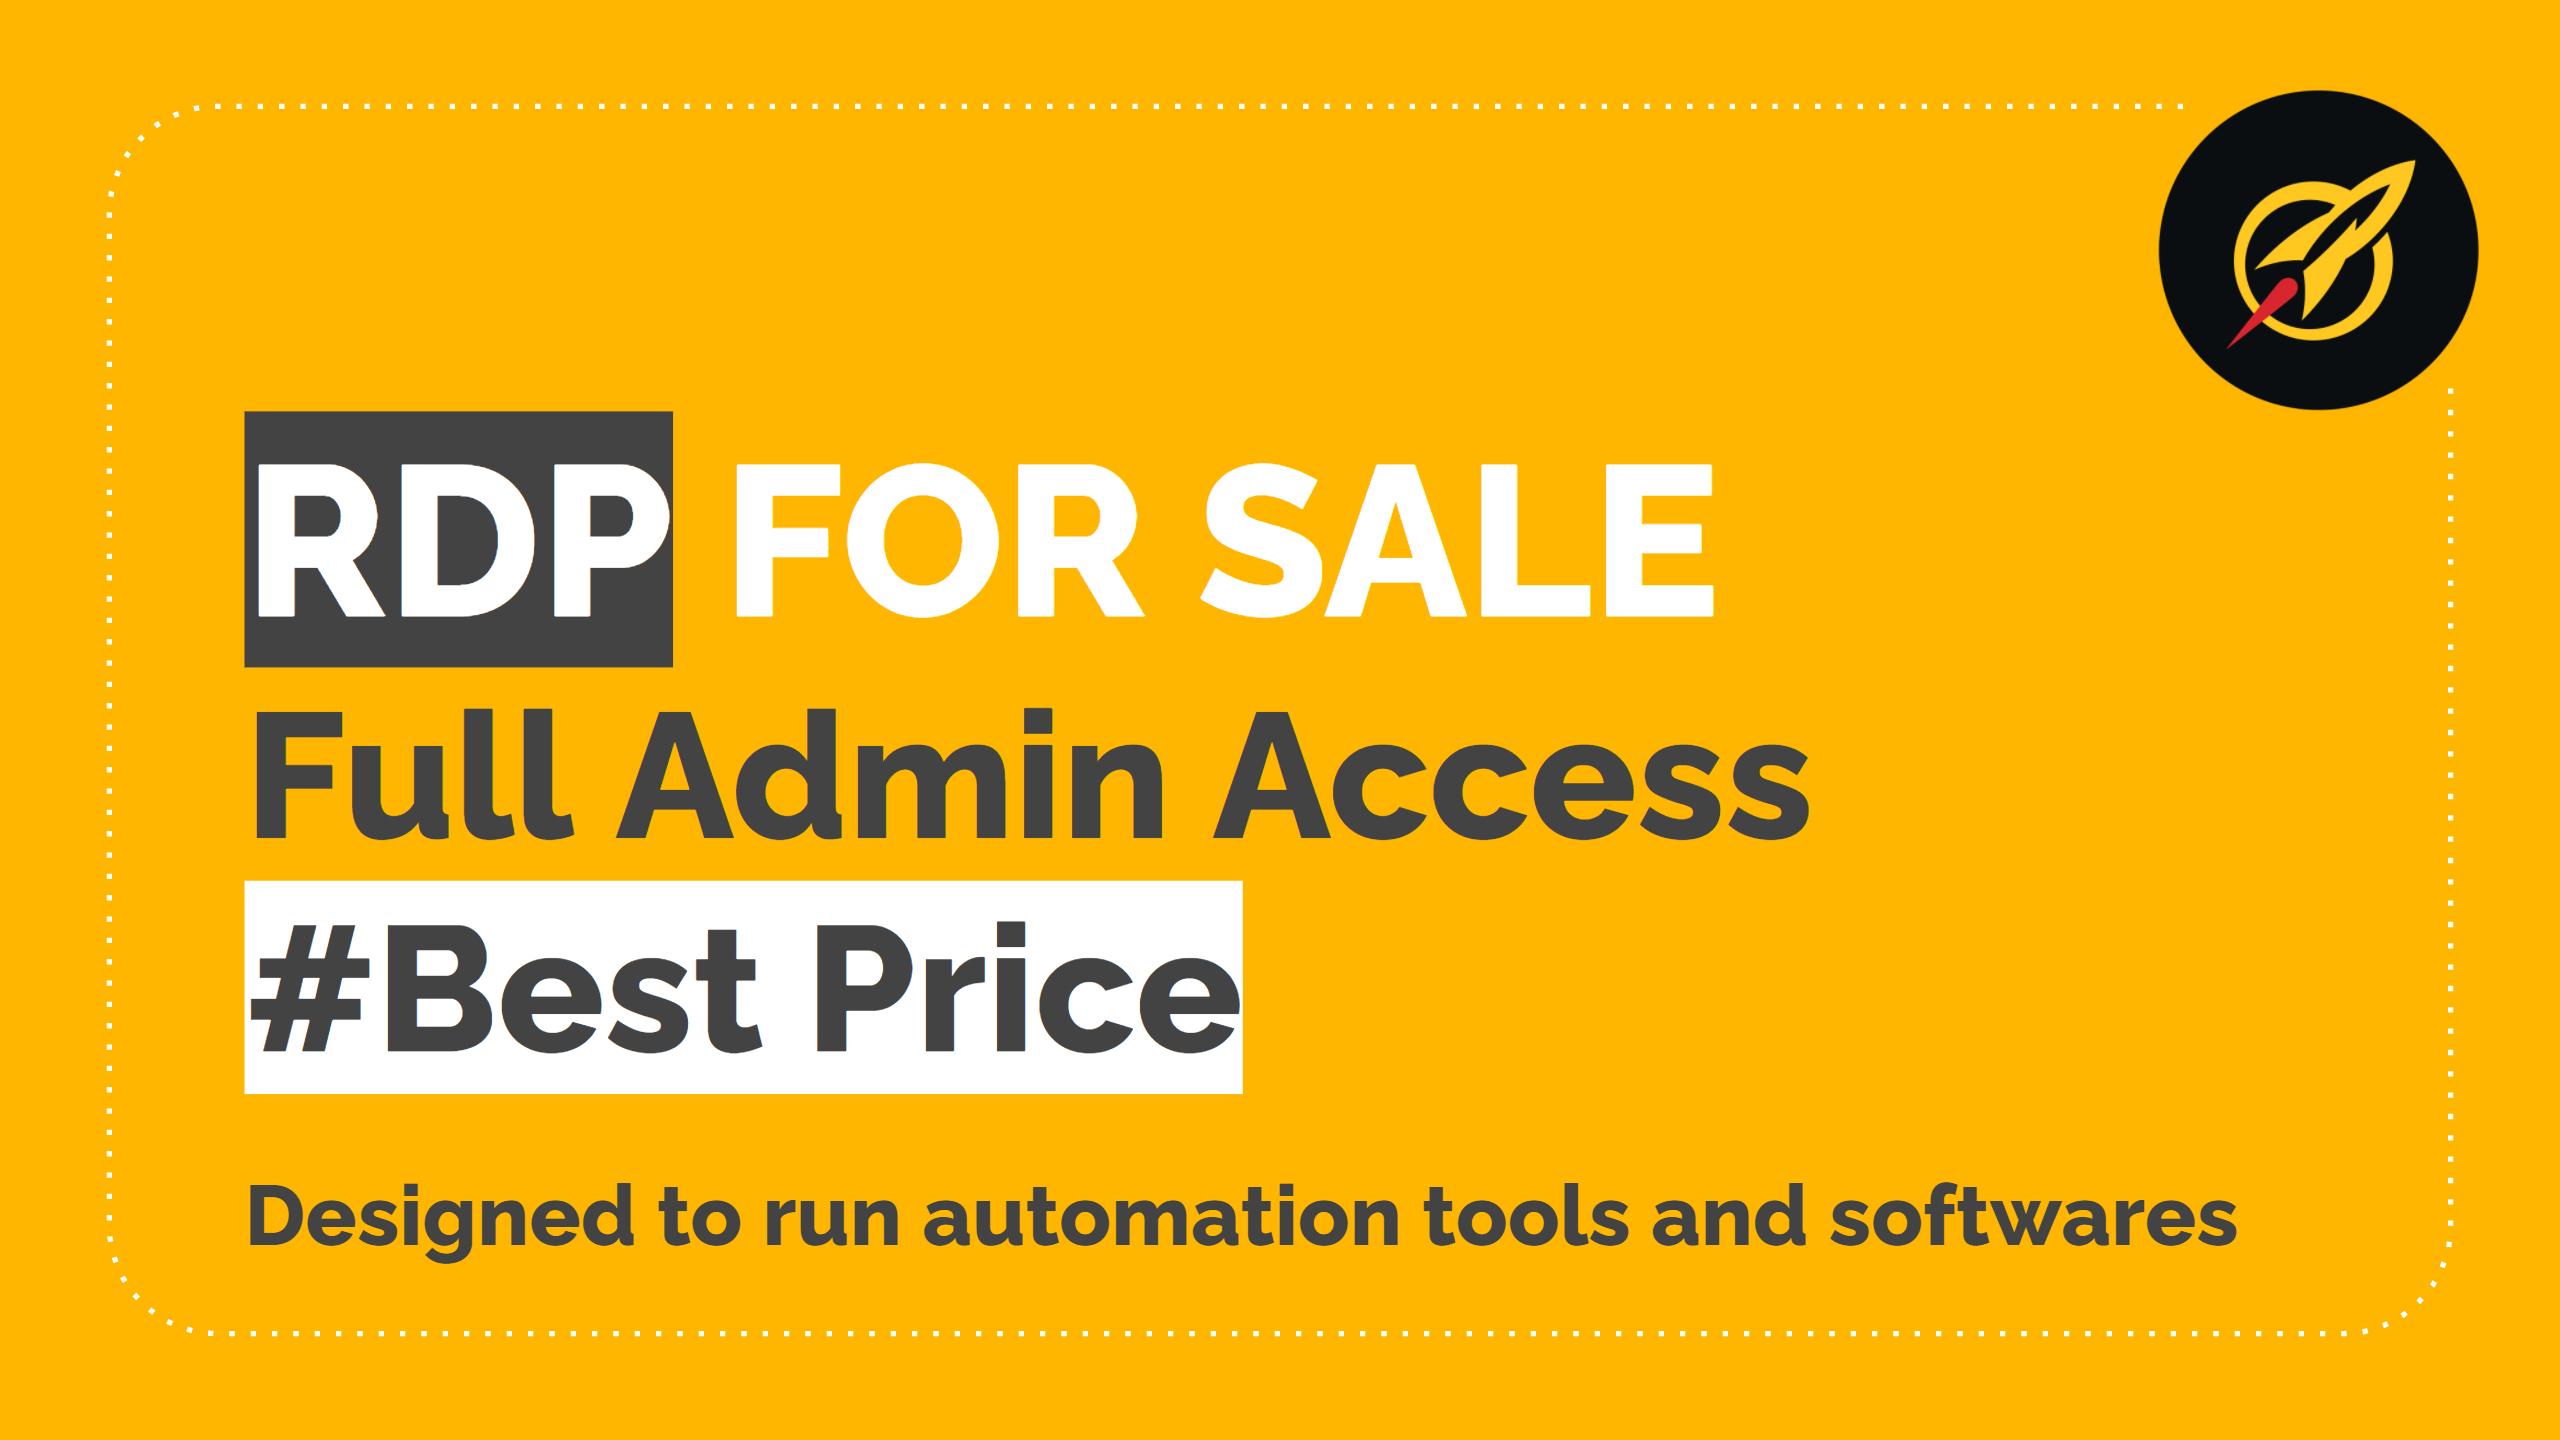 RDP (Remote Desktop Protocol) For Sale